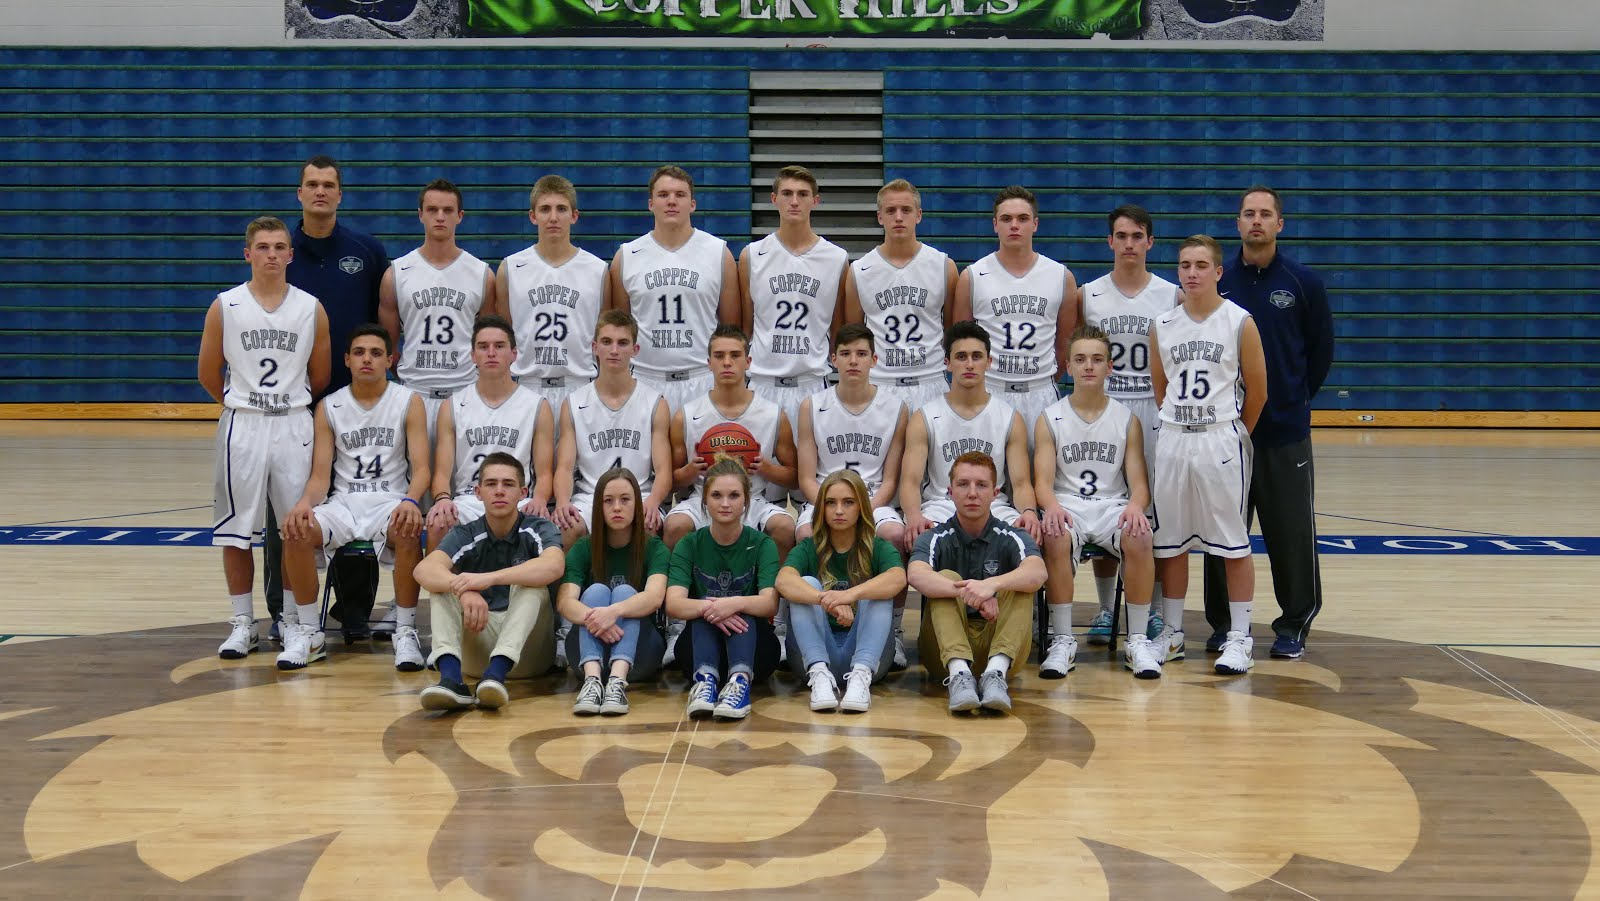 2015-2016 Varsity Team